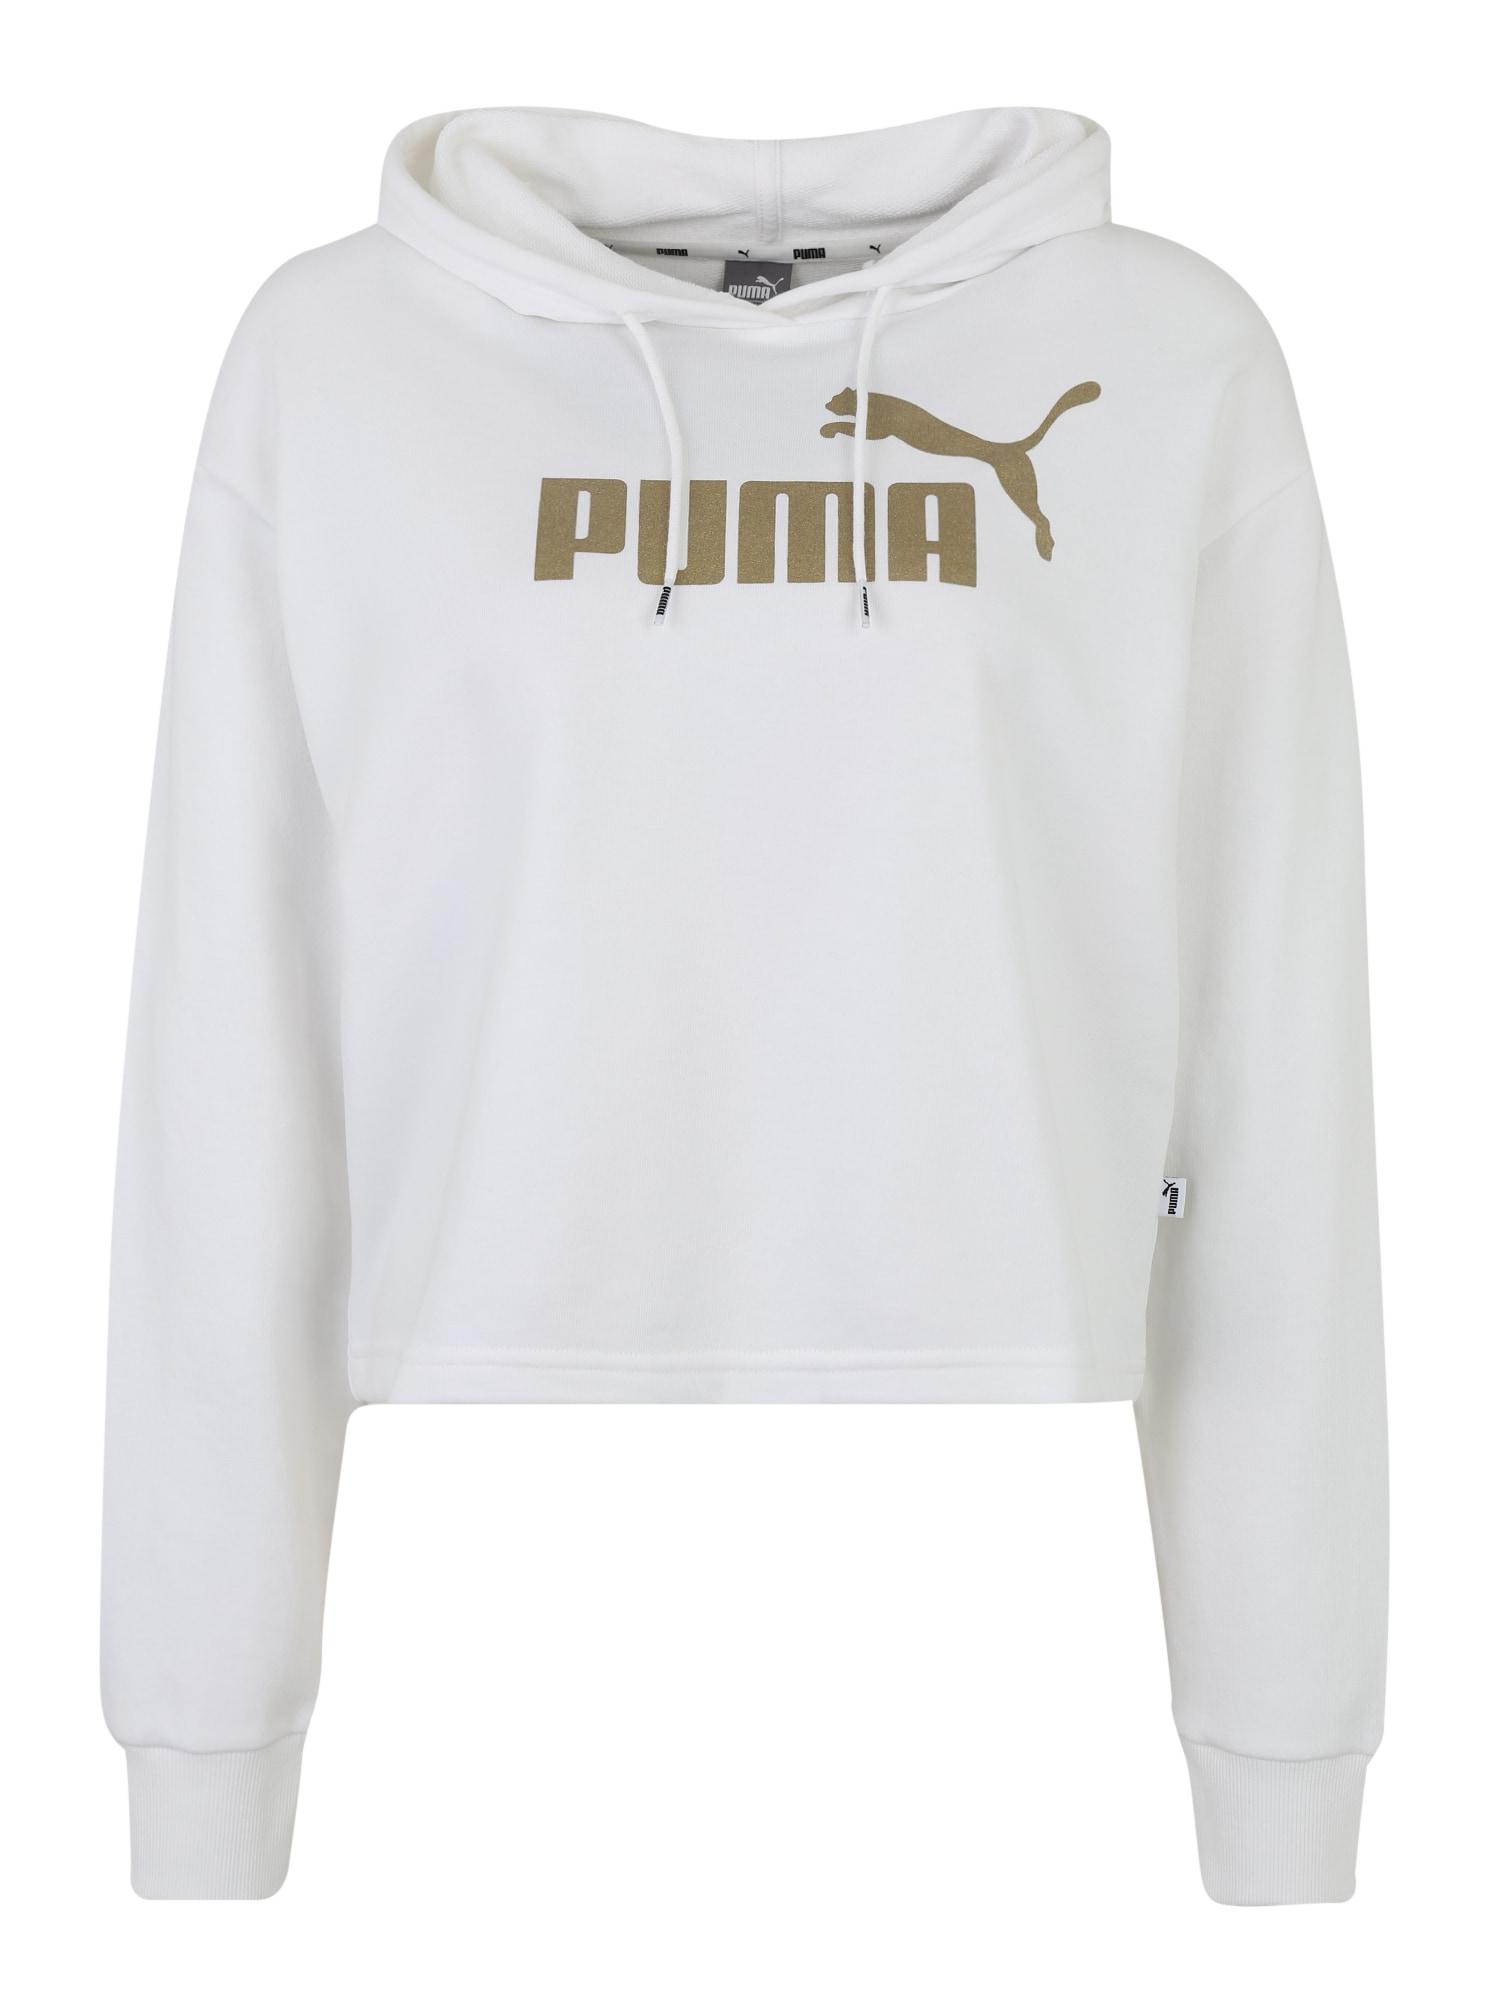 PUMA Sportinio tipo megztinis auksas / balta